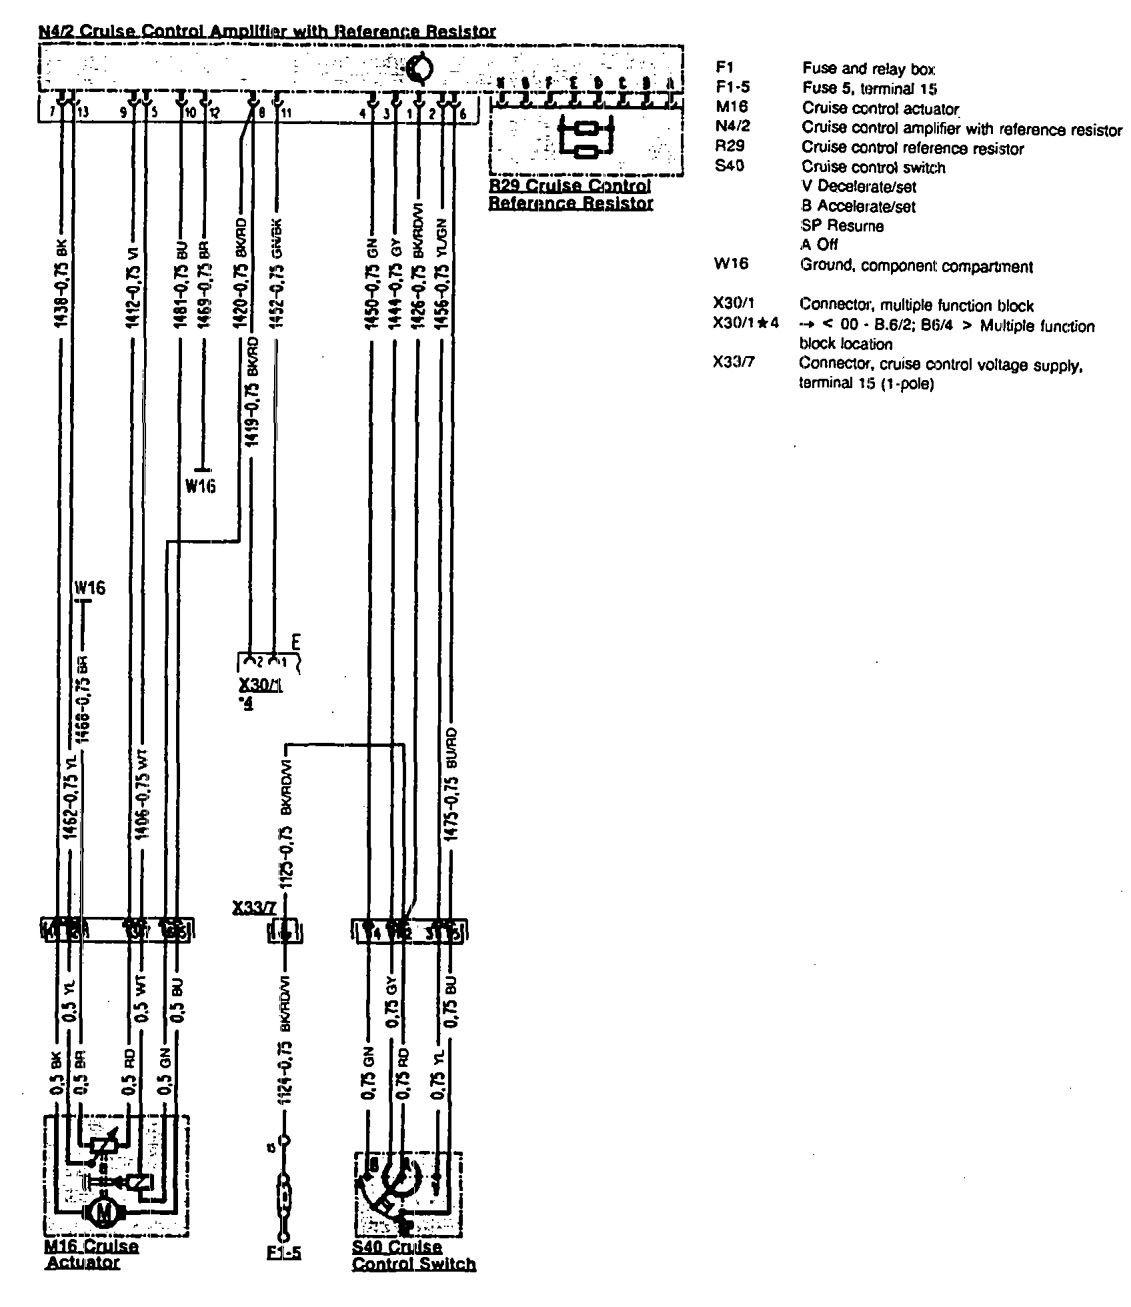 Mercedes-Benz 300SL (1990 - 1993) - wiring diagrams - speed controls ...